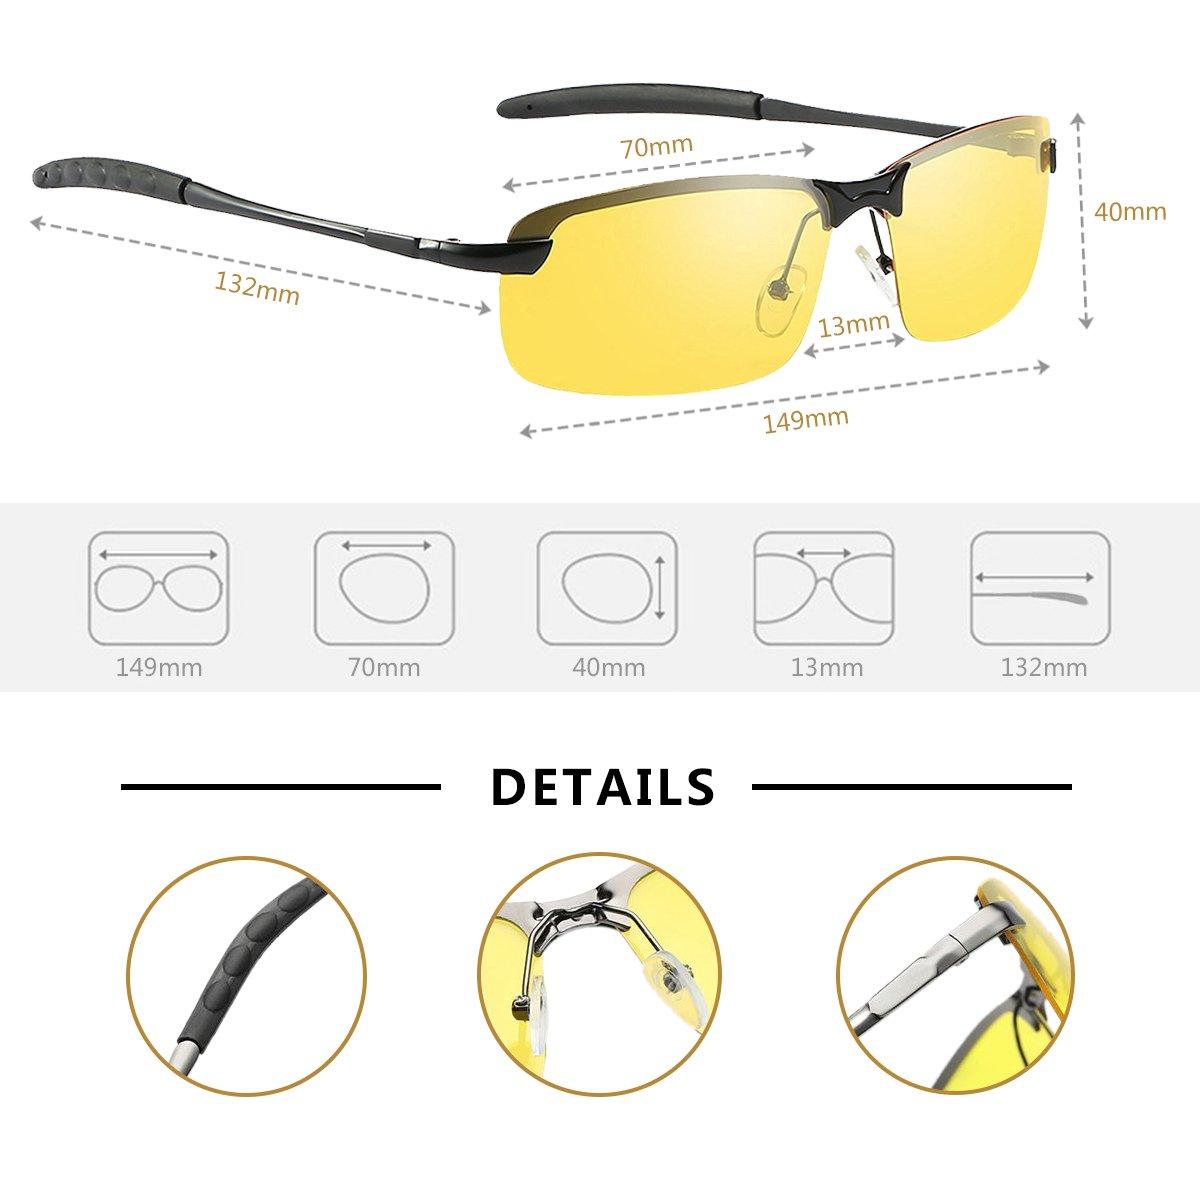 Amazon.com: Gafas de sol polarizadas, gafas de conducción para todo clima - Protección UV: Clothing